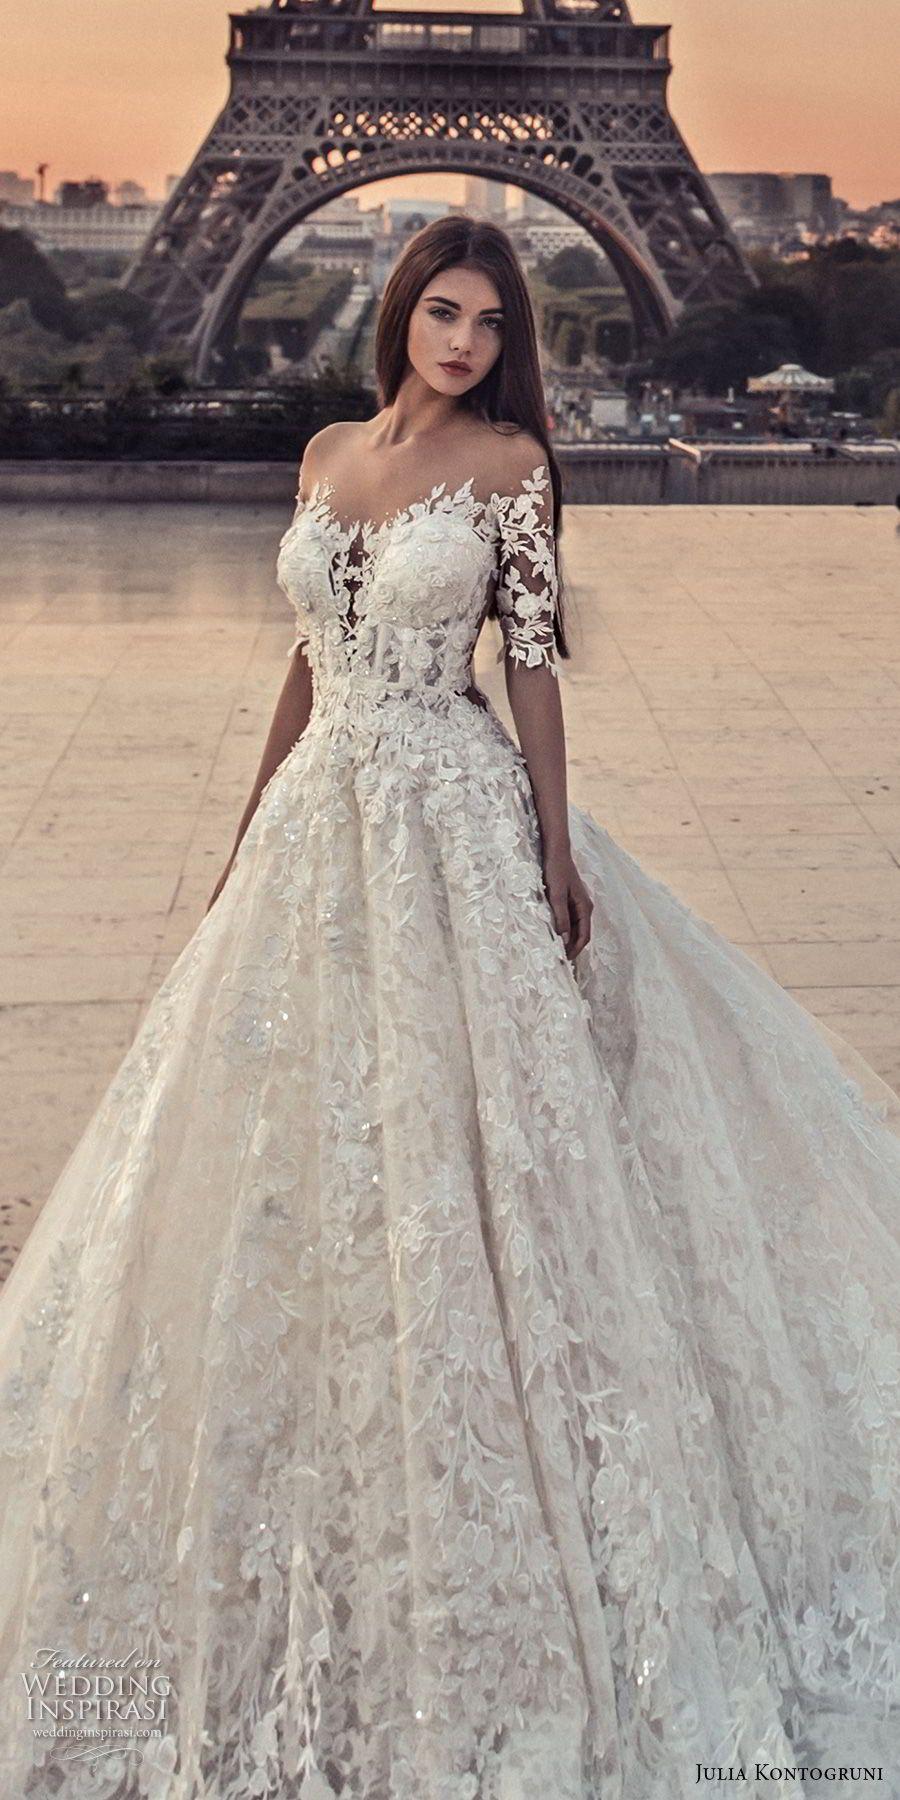 Julia Kontogruni Wedding Dresses 2018 Paris Bridal Collection Wedding Inspirasi Sheer Wedding Dress Fairy Tale Wedding Dress Princess Wedding Dresses [ 1800 x 900 Pixel ]